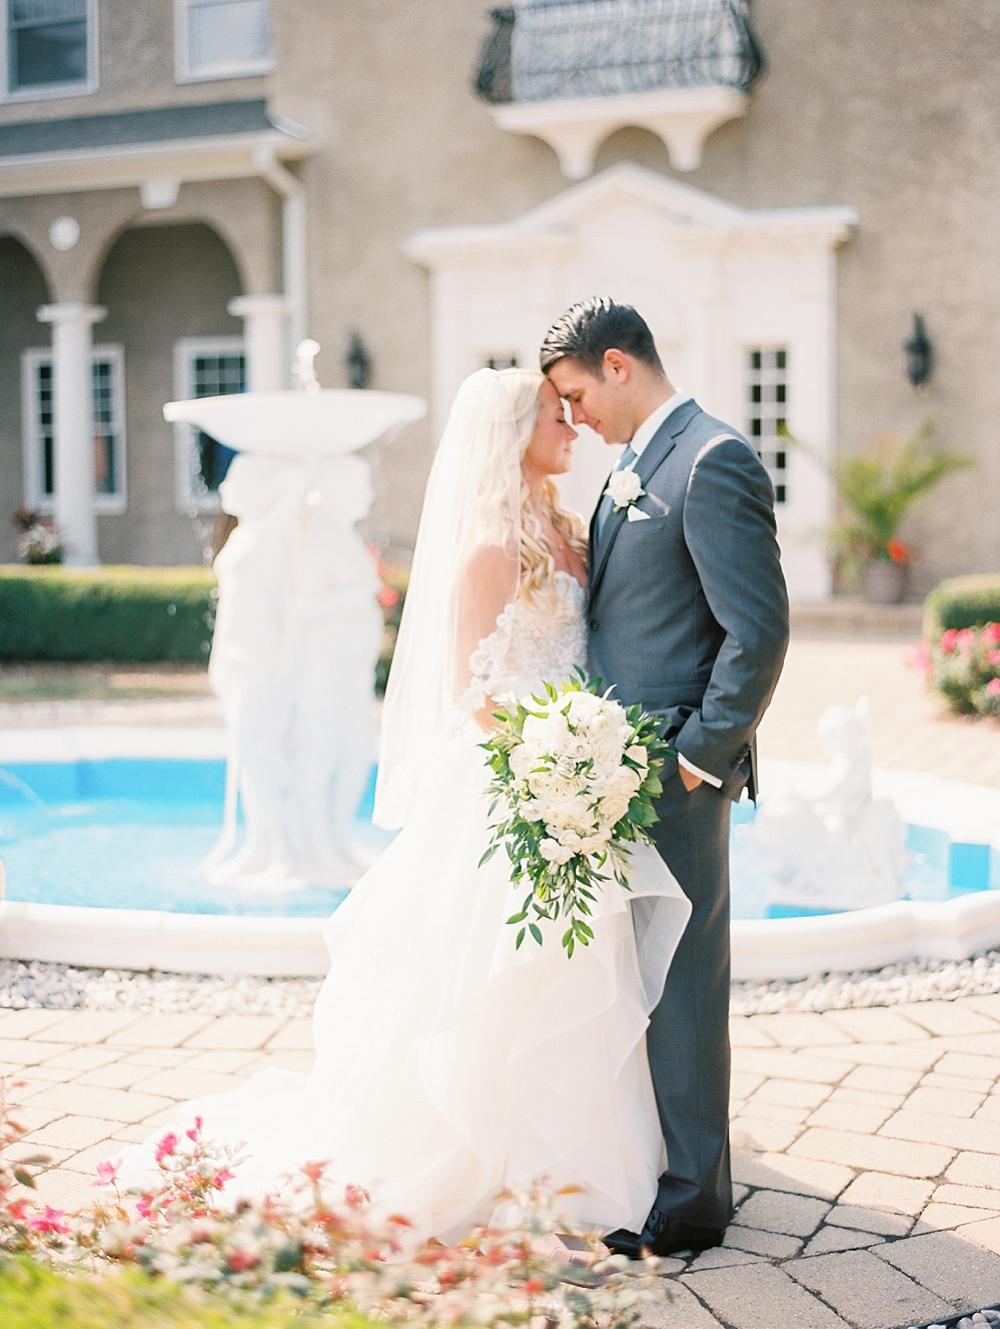 kristin-la-voie-photography-lehmann-mansion-wedding-photographer-137